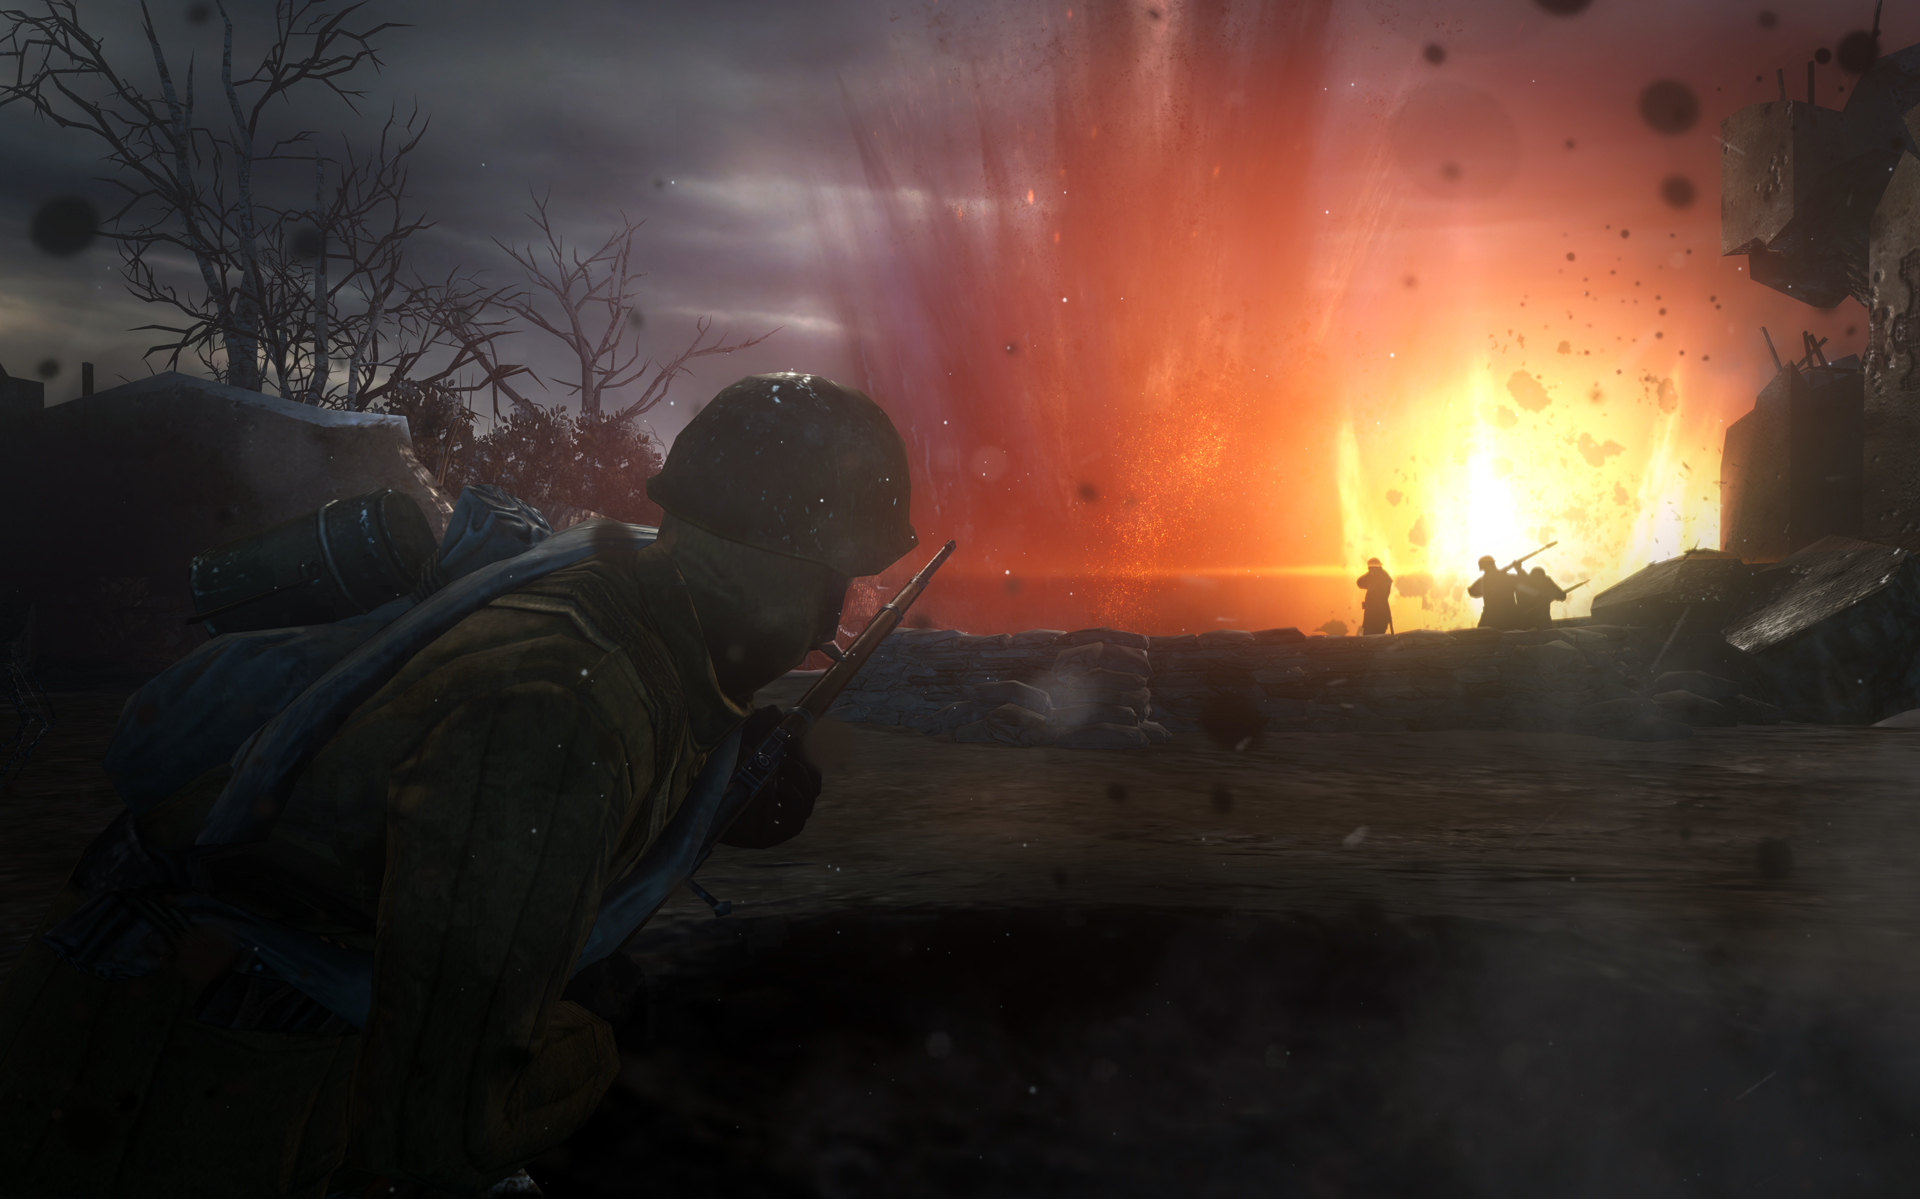 CompanyofHeroes2_VictoryatStalingrad_Explosion